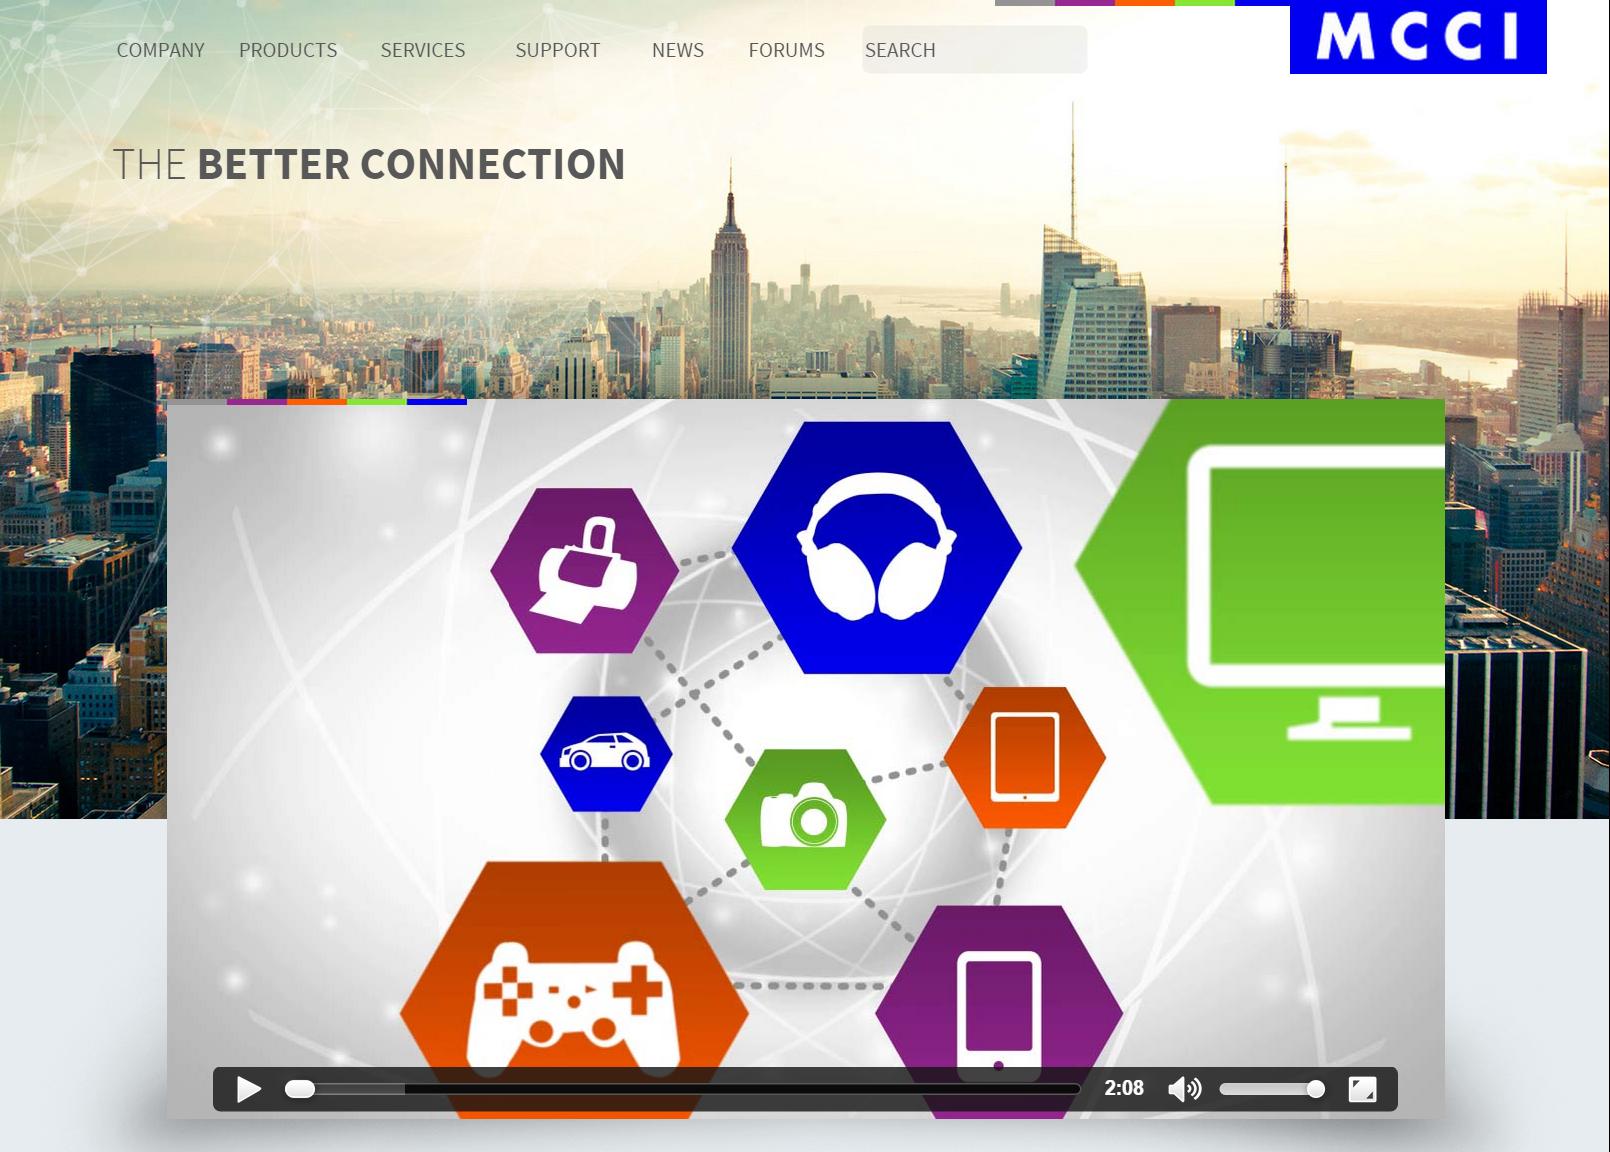 MCCI社のTrueTask USBが、Raspbery Pi2のWindows 10 IoT Coreに採用される